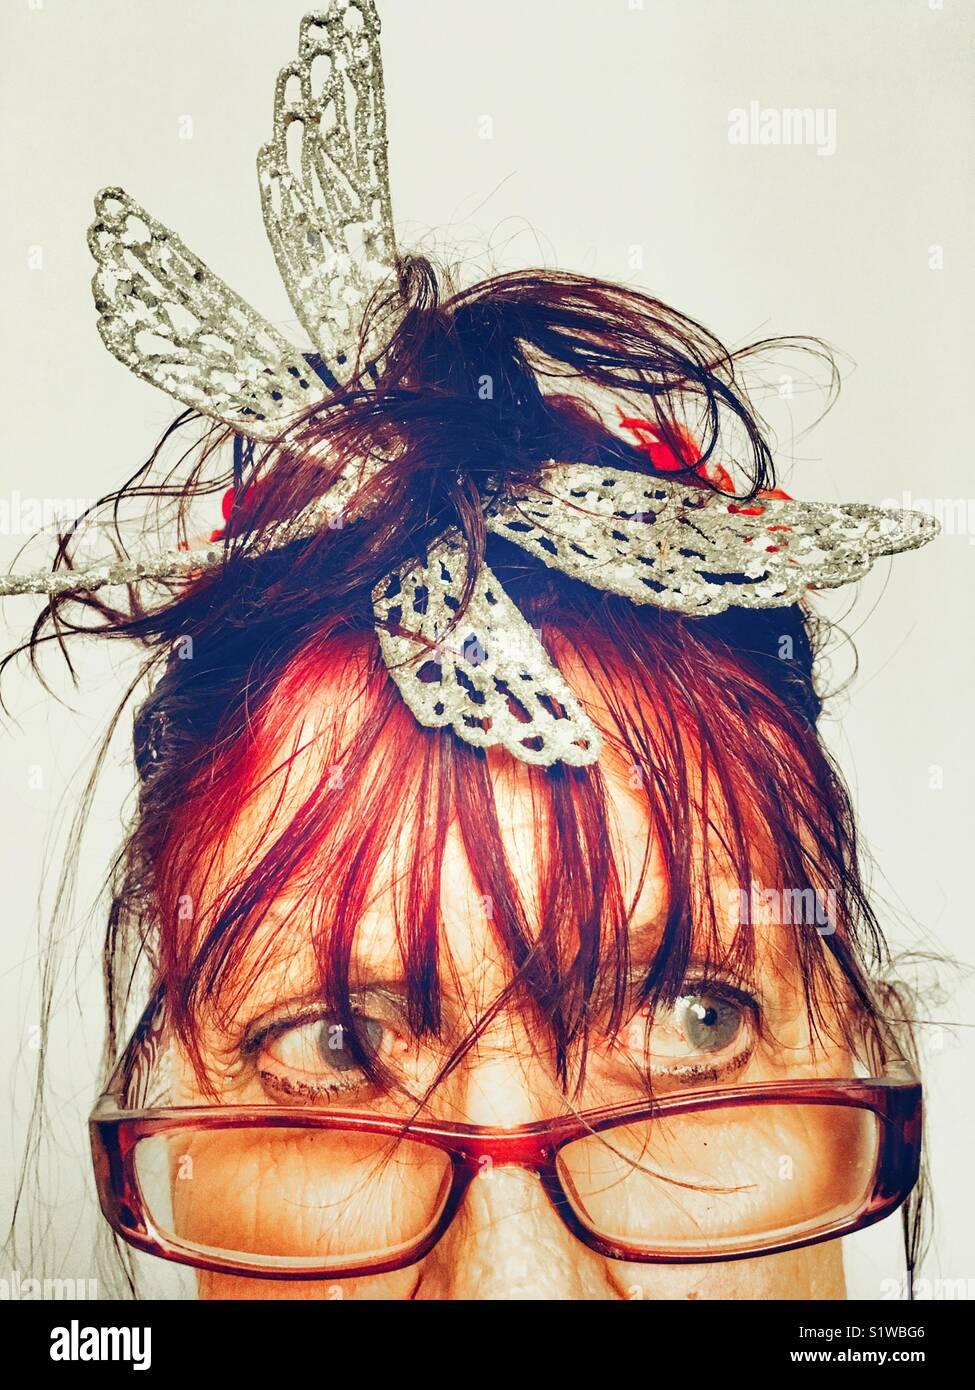 La mujer mariposa Imagen De Stock